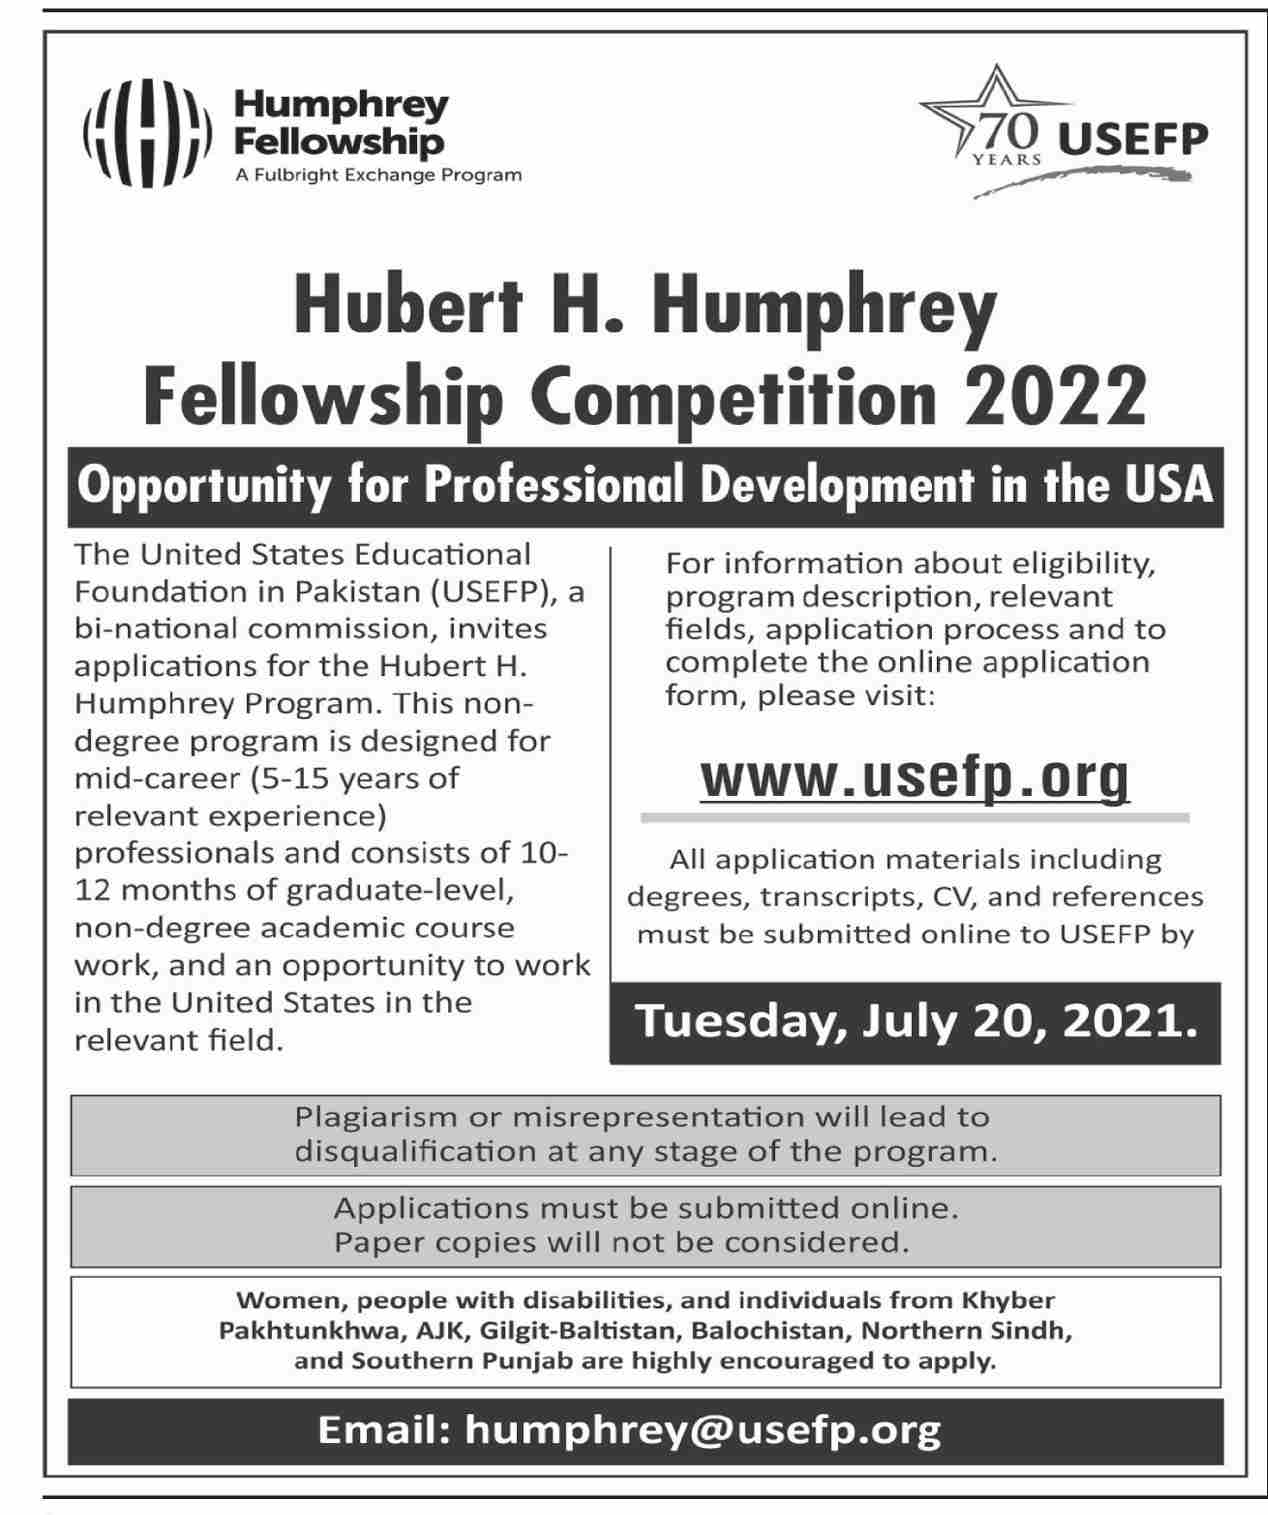 USEF Hubert H Humphery Fellowhisp Comprtition 2021